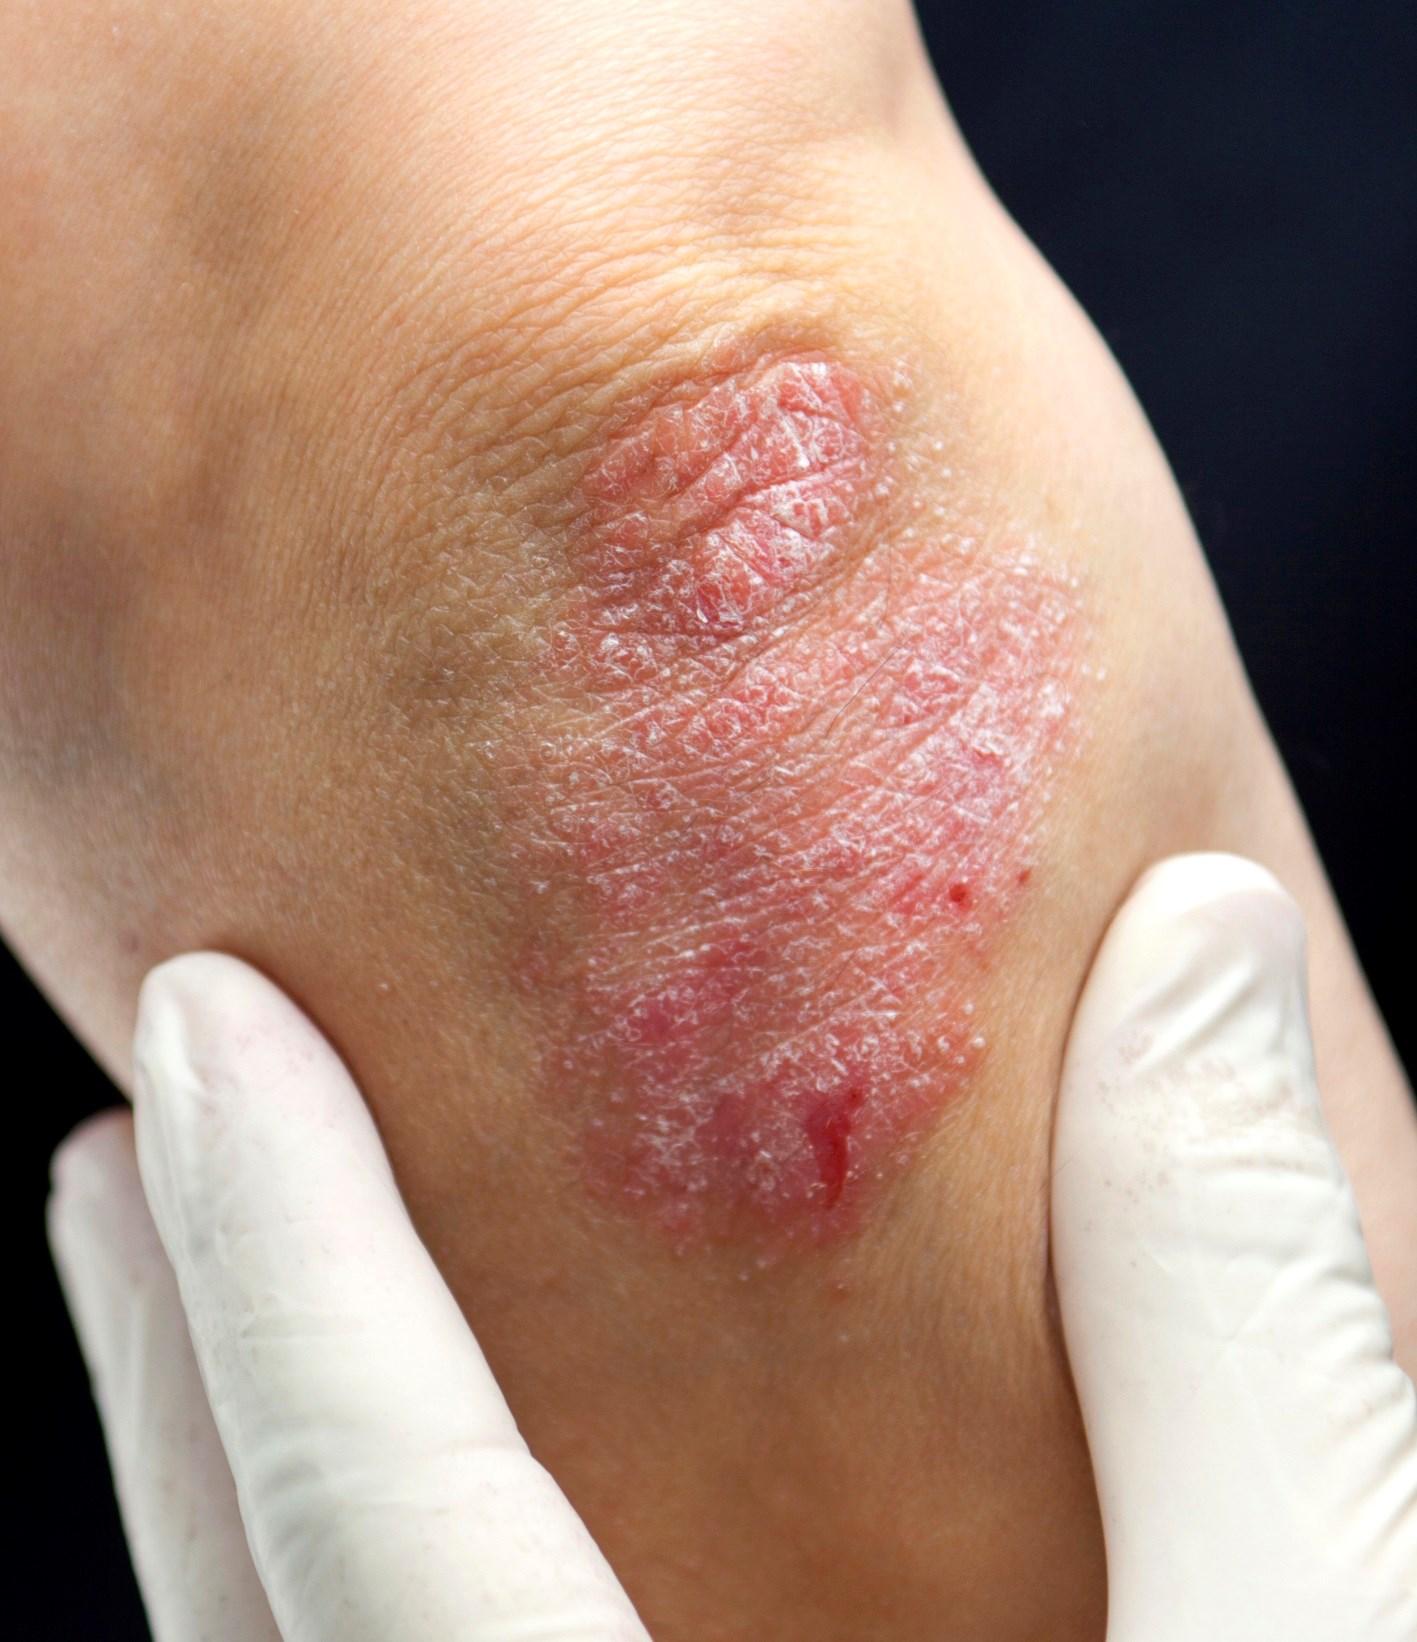 Adalimumab Biosimilar ABP 501 Safe, Effective for Psoriasis